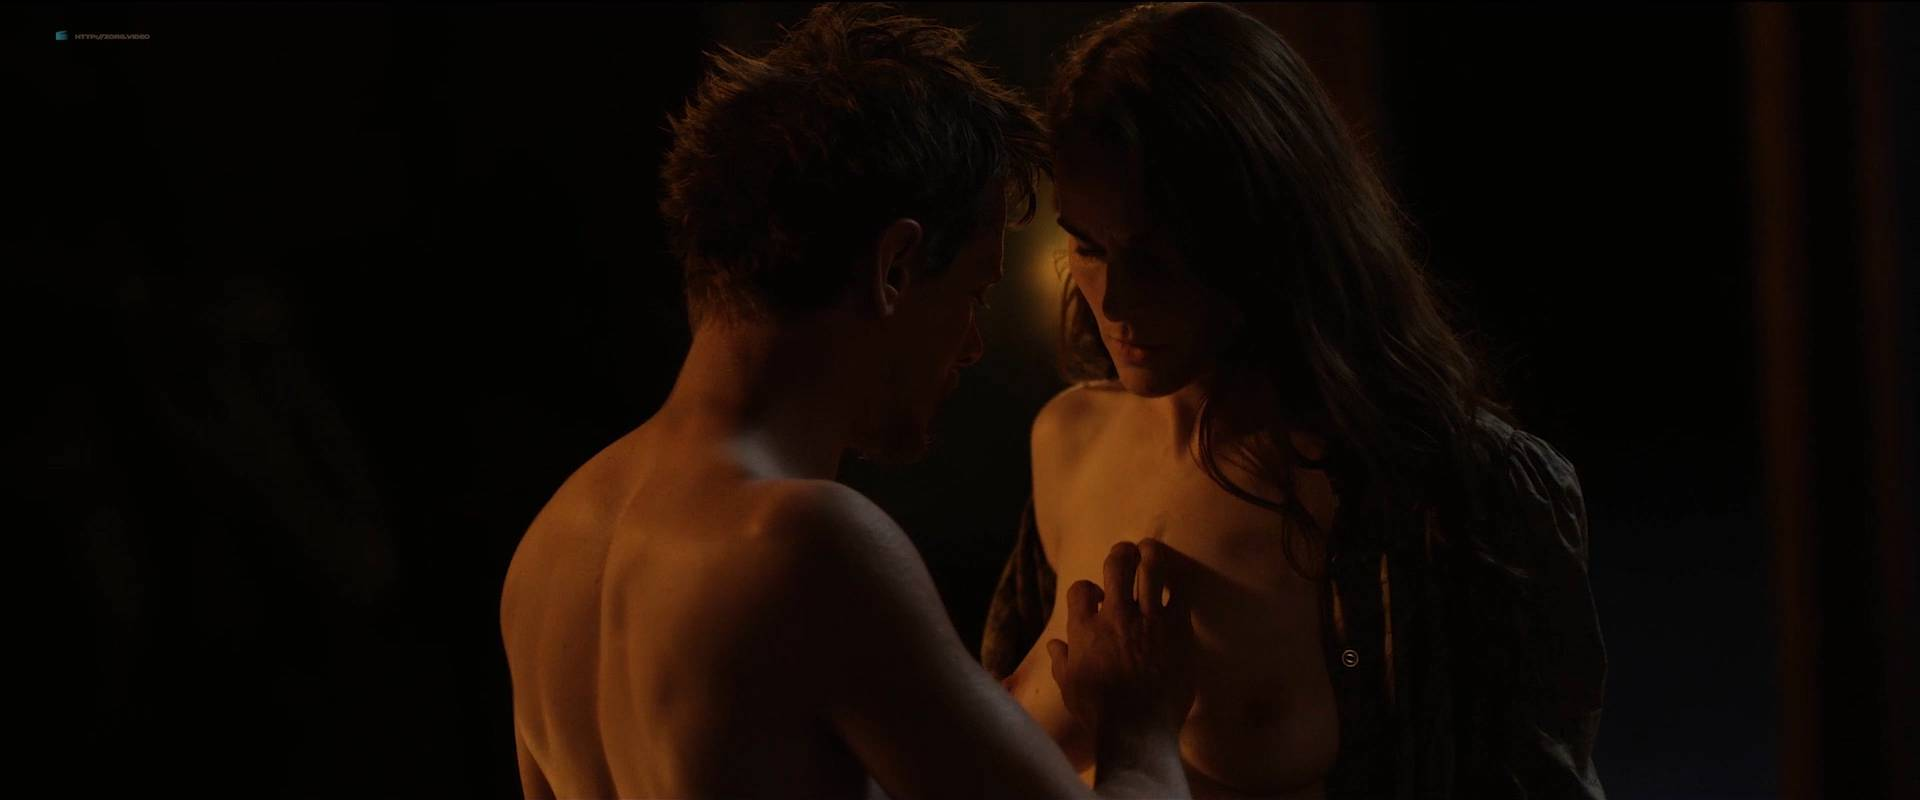 Michelle Dockery Nude Topless Godless 2017 Sp Web 4